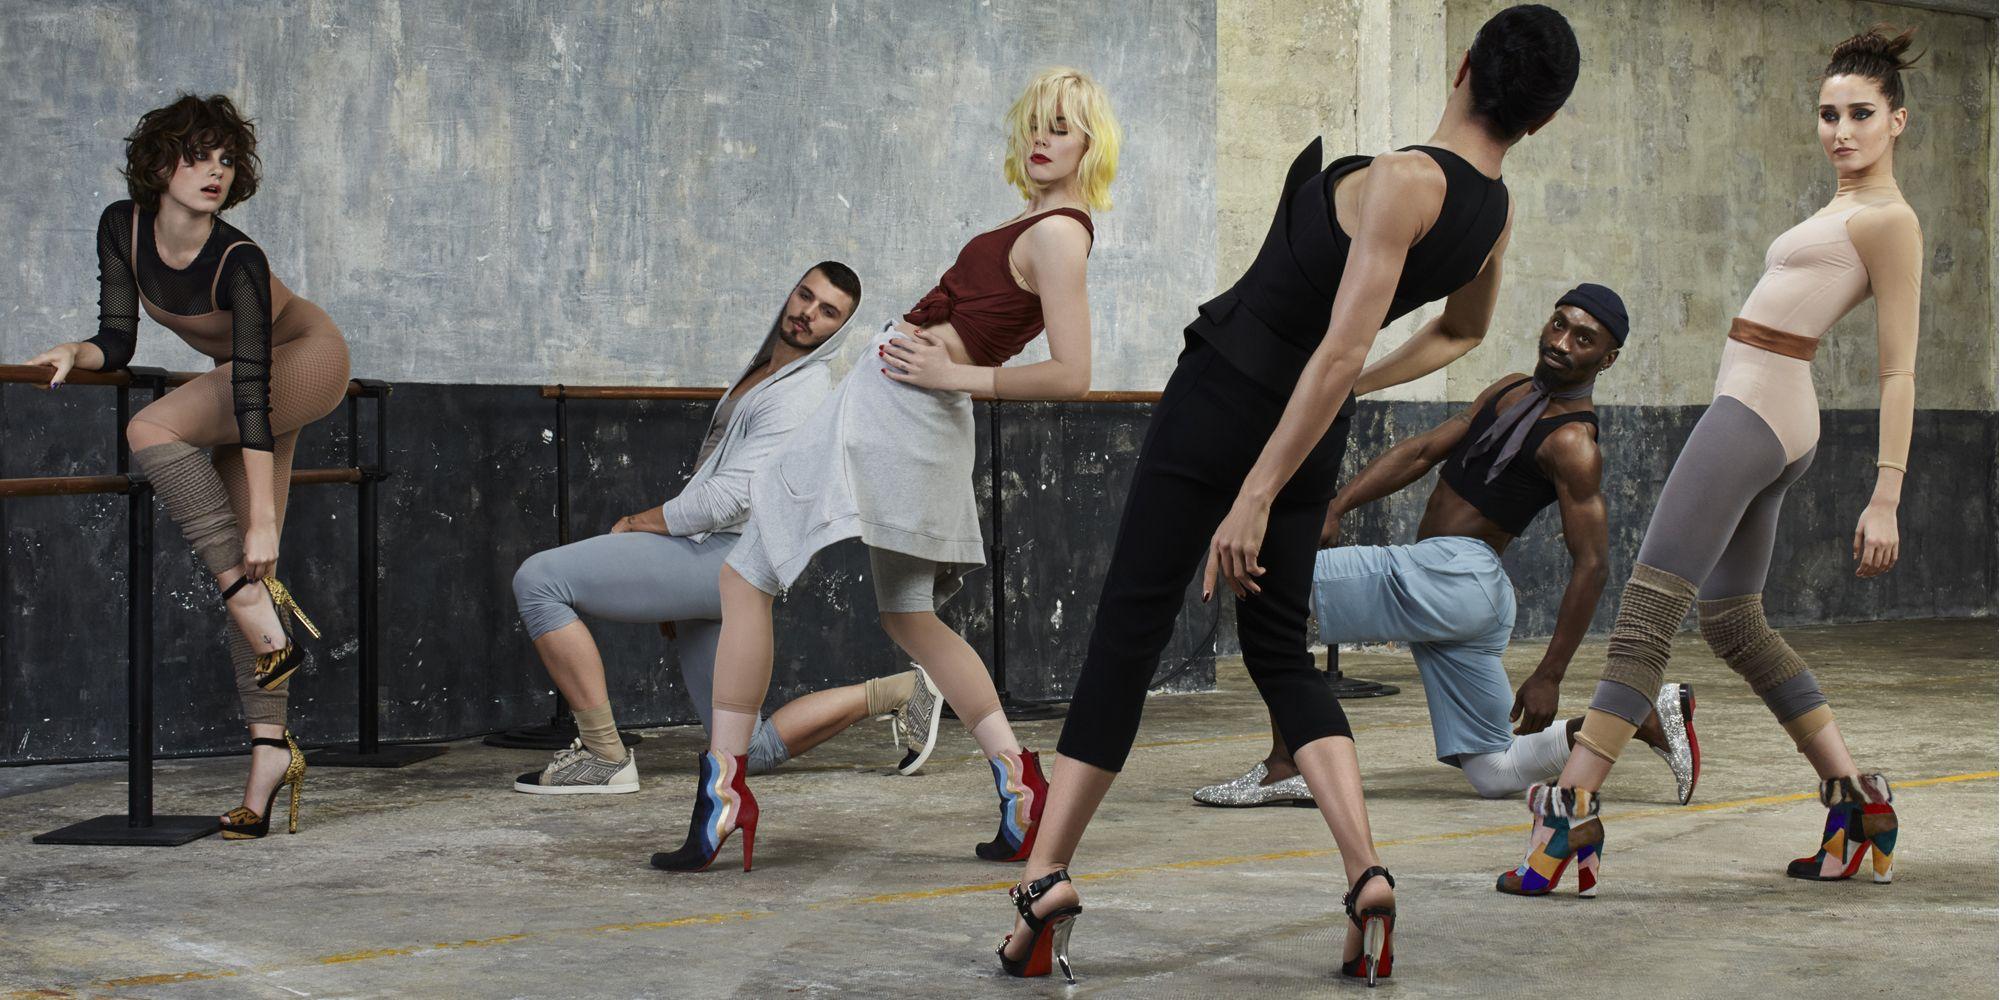 Christian Louboutin Taps Choreographer Blanca Li For New Short Dance Film